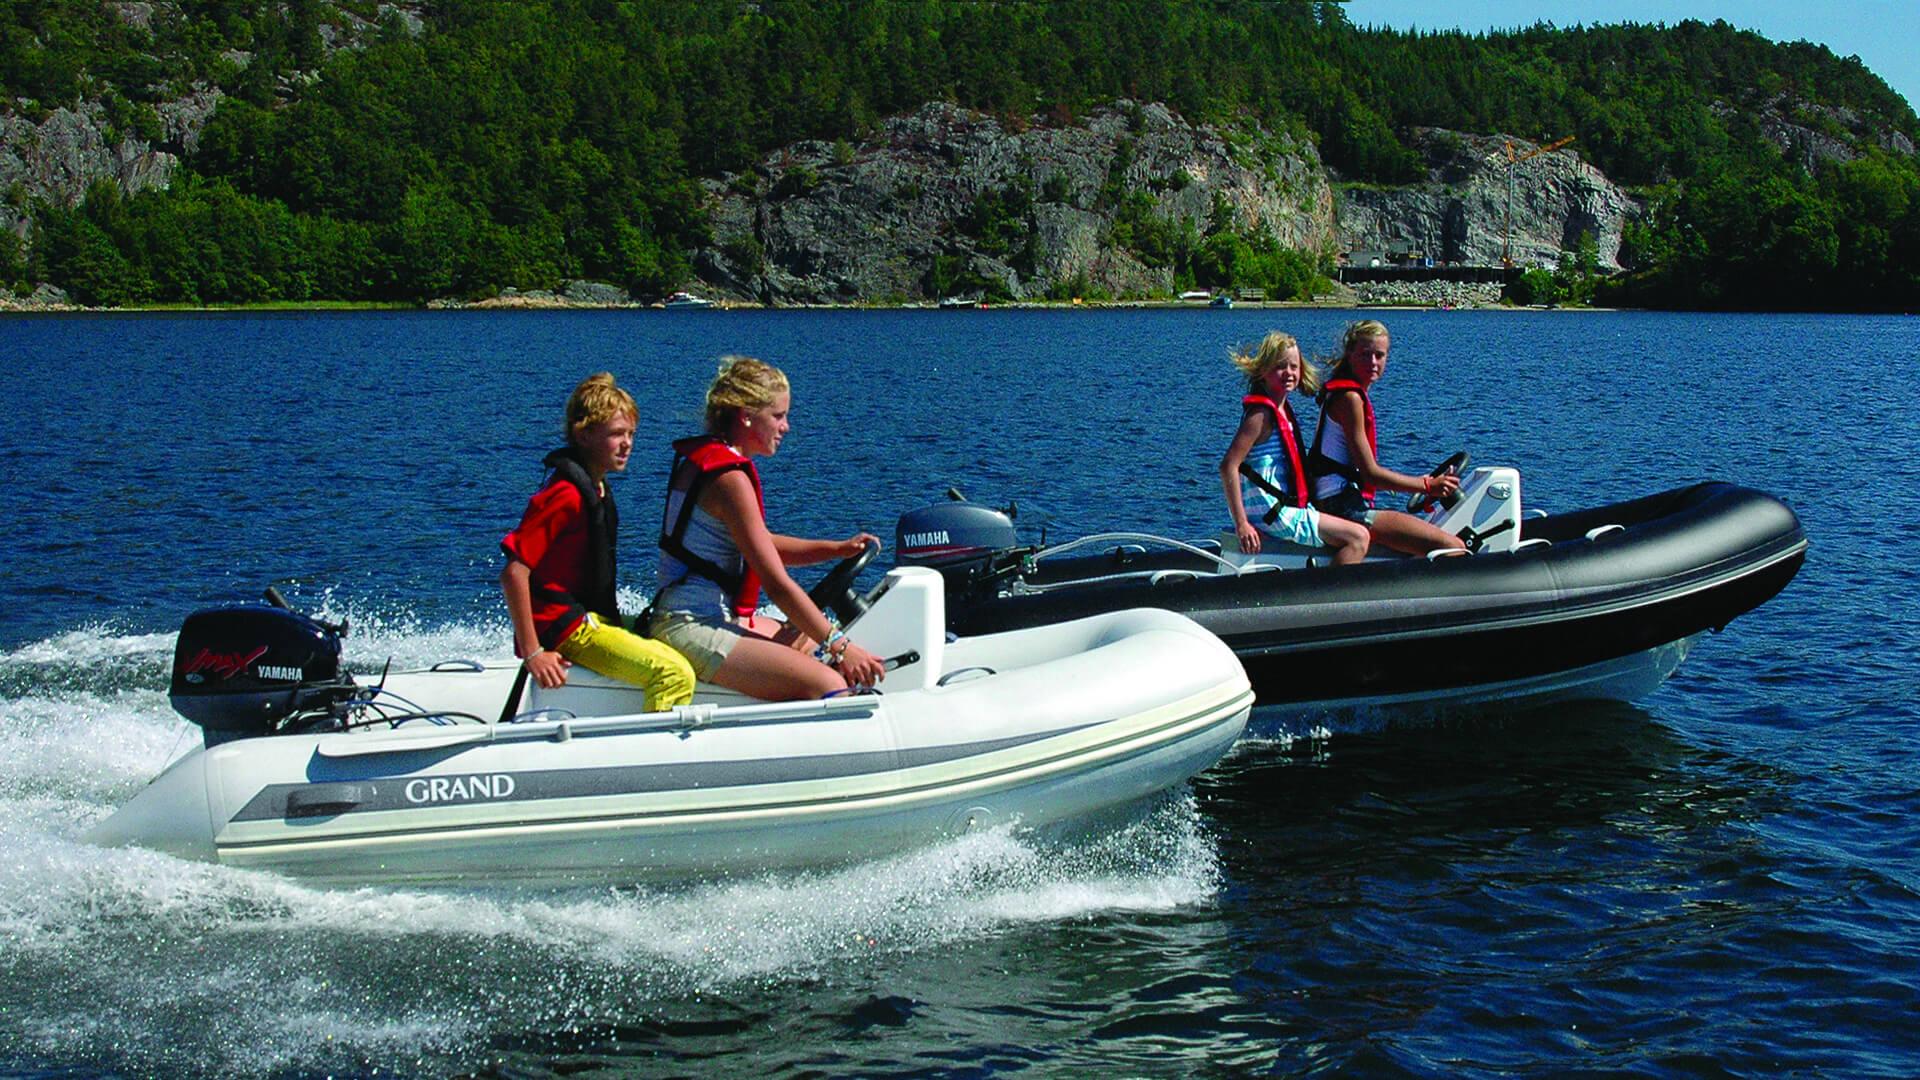 Надувная лодка с жестким дном GRAND Silver Line S300S, Надувная лодка GRAND Silver Line S300S, GRAND Silver Line S300S, GRAND Silver Line S300SF, GRAND S300S, GRAND S300SF, GRAND S300, Надувная лодка GRAND, Надувная лодка ГРАНД, Надувная лодка с жестким дном, RIB, Rigid Inflatable Boats